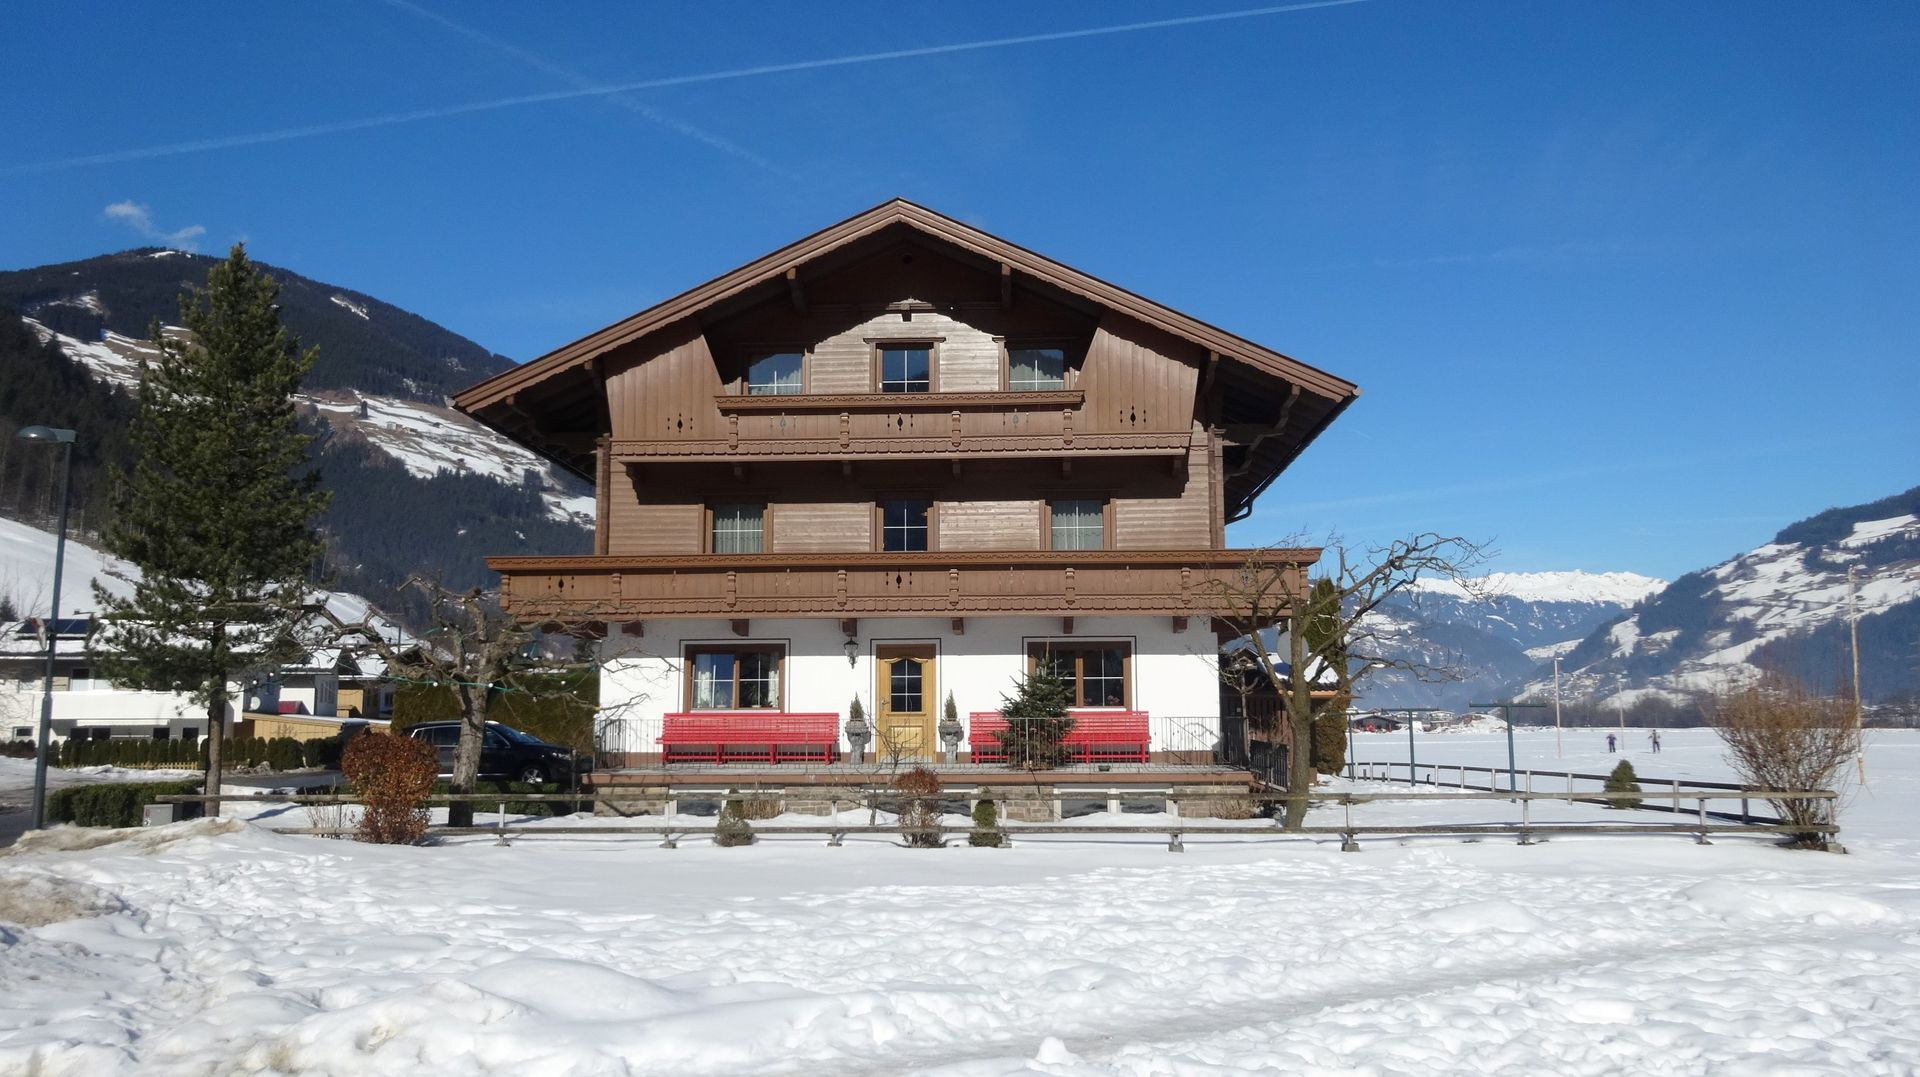 Mayrhofen - Haus Kreidl